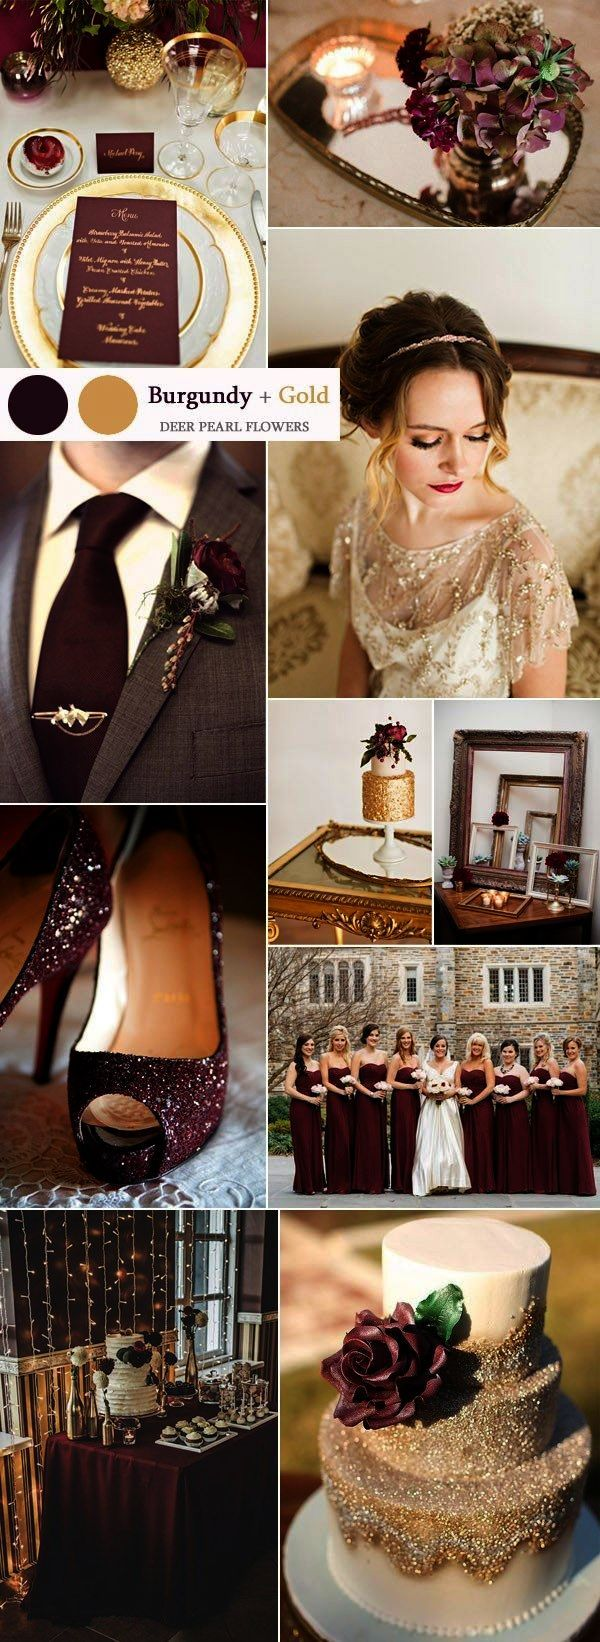 Wedding decorations theme october 2018 Wedding Tips Pinterest Unique Wedding Ideas For Reception